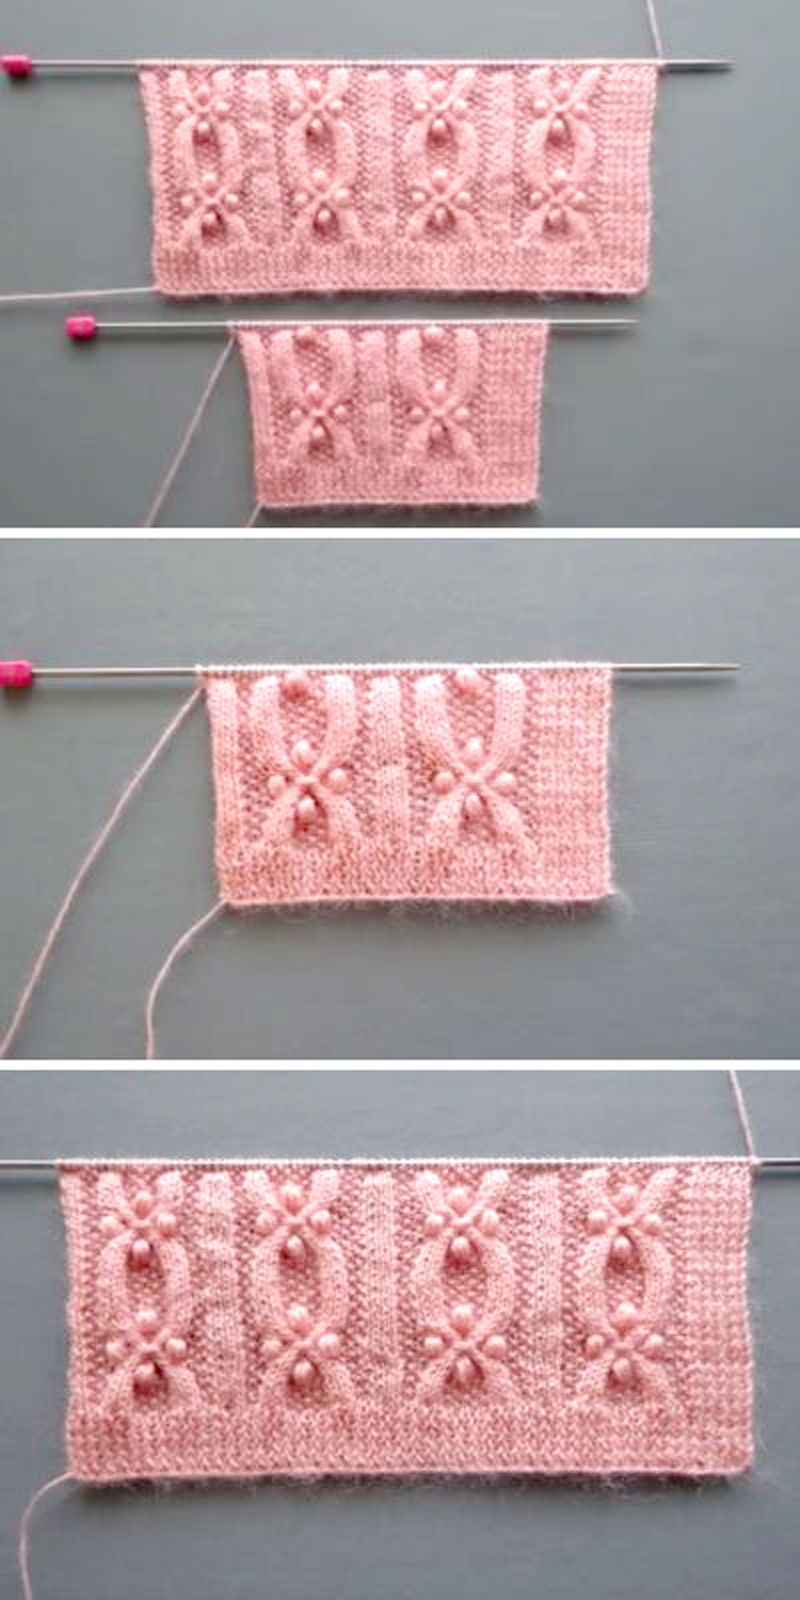 Amazing Knitting - Knitting Tutorial